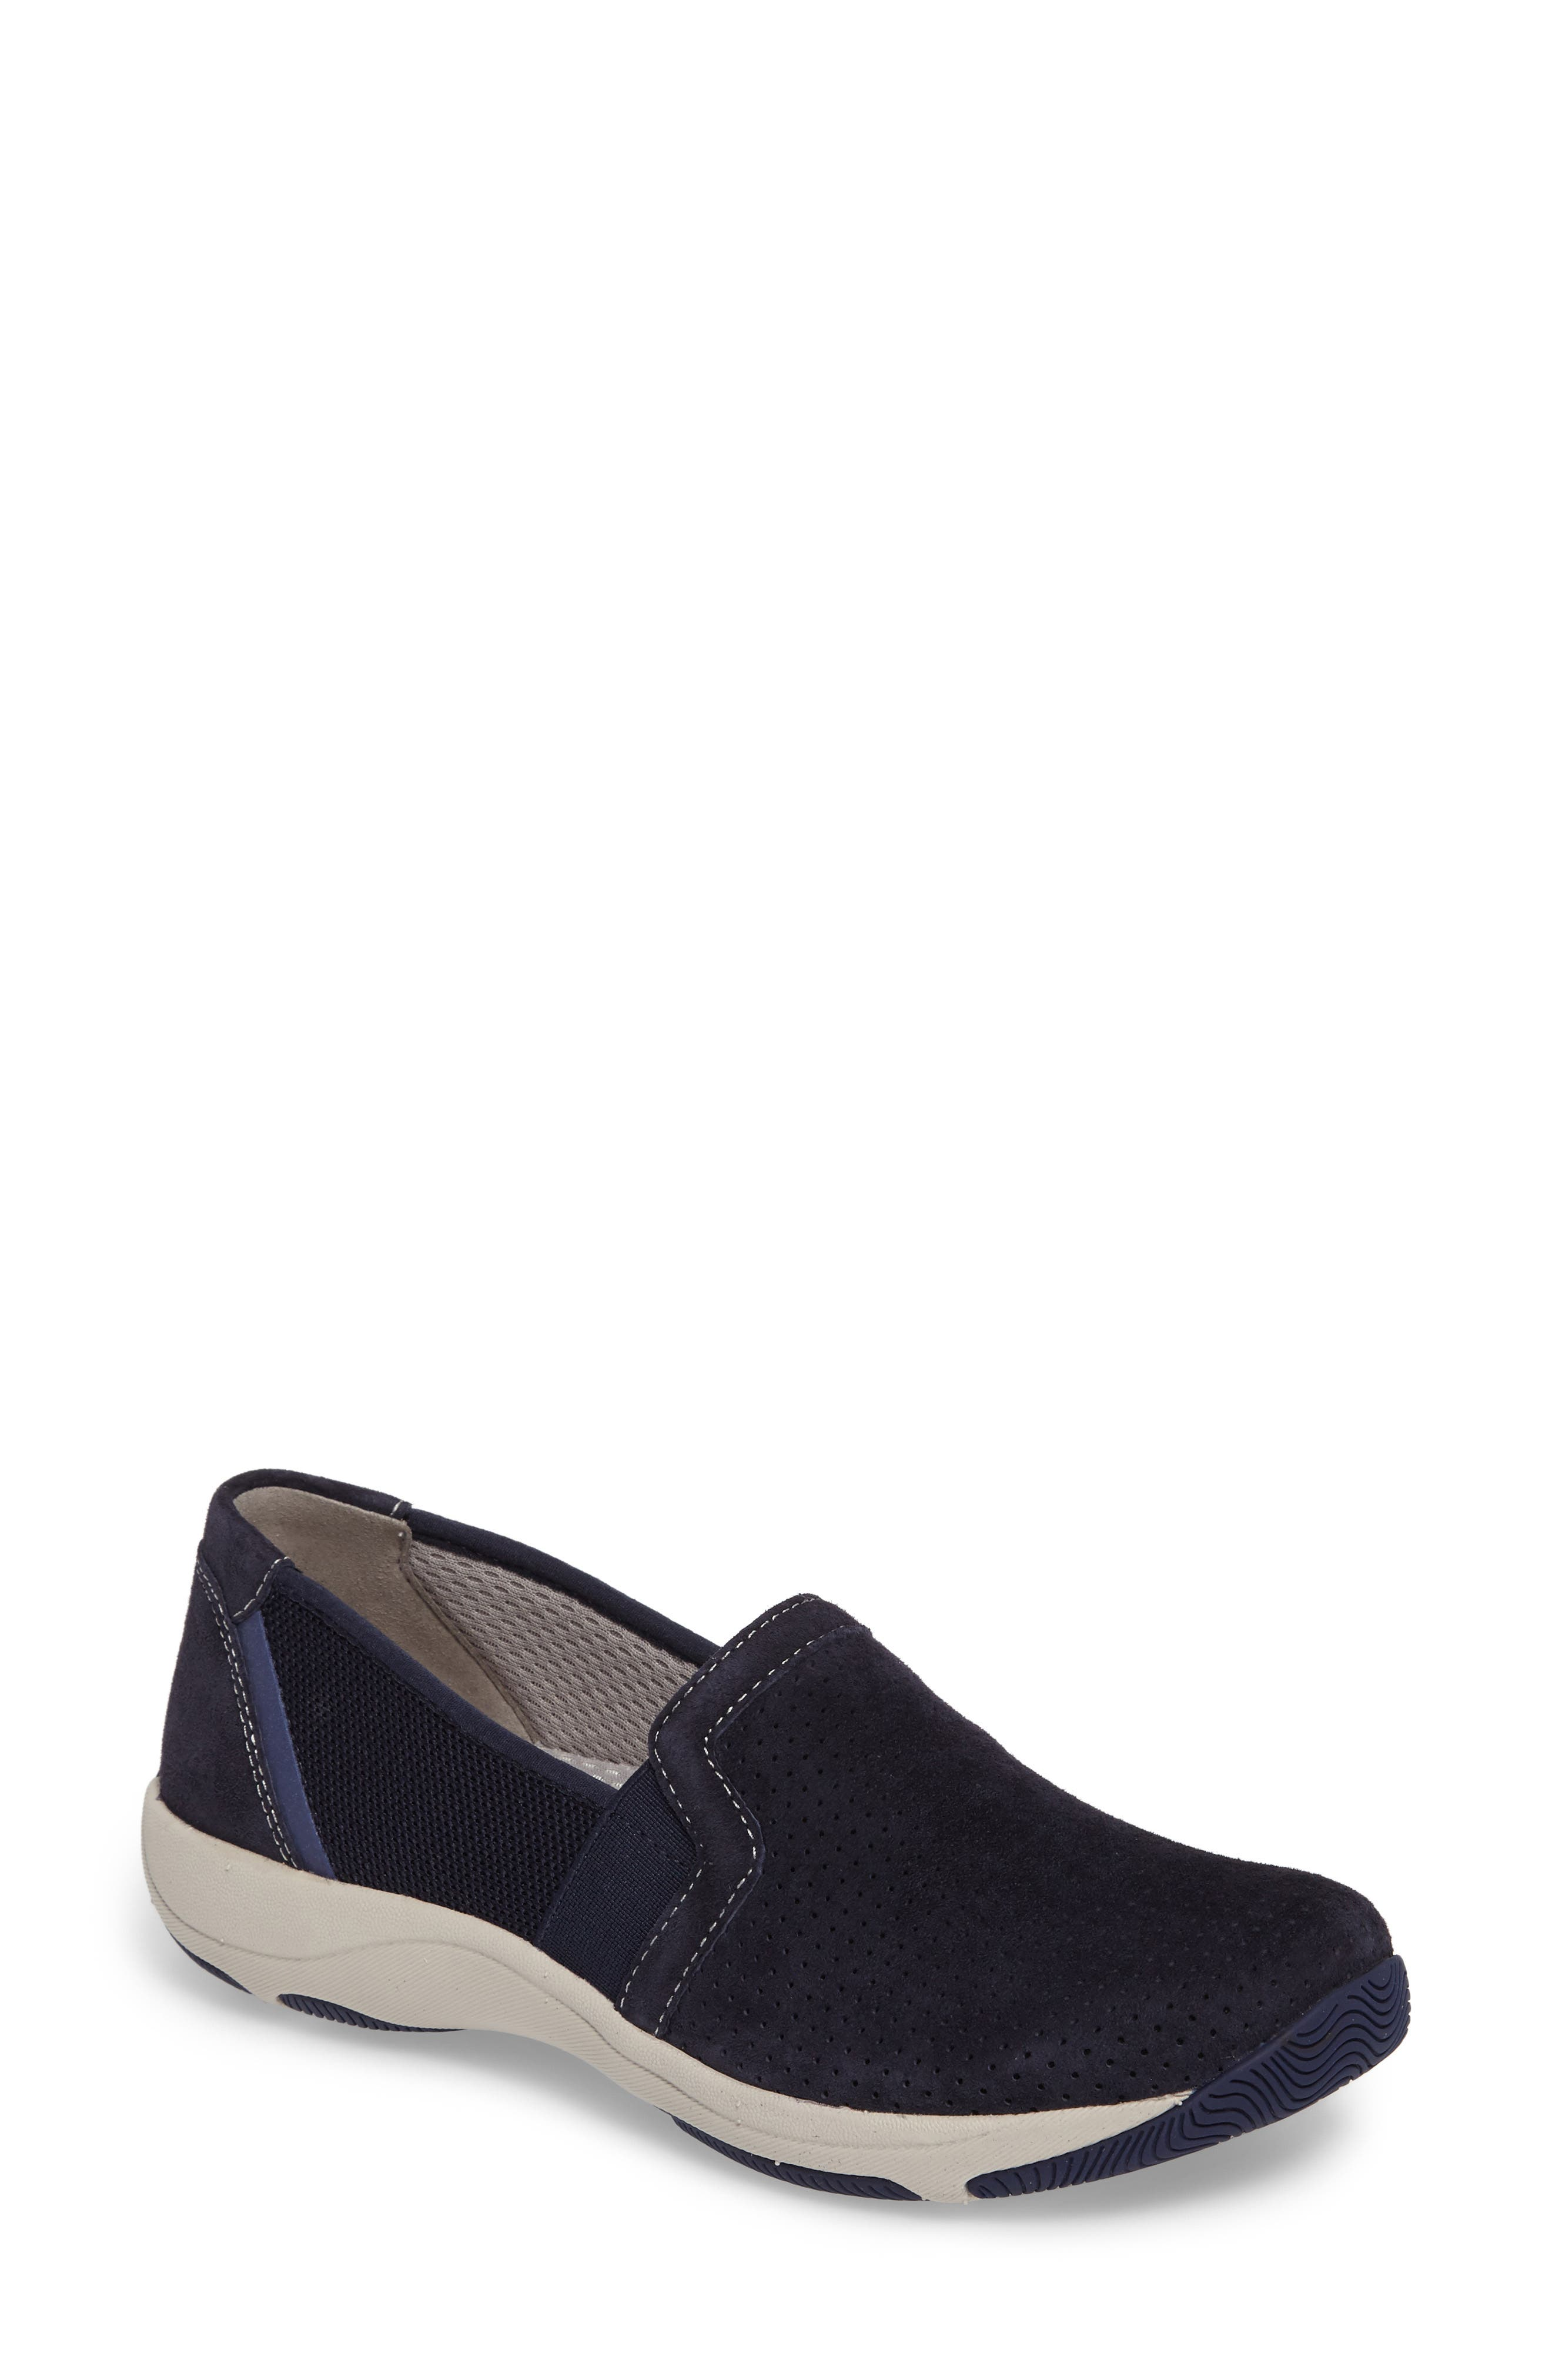 Dansko Halifax Collection Halle Slip-On Sneaker (Women)